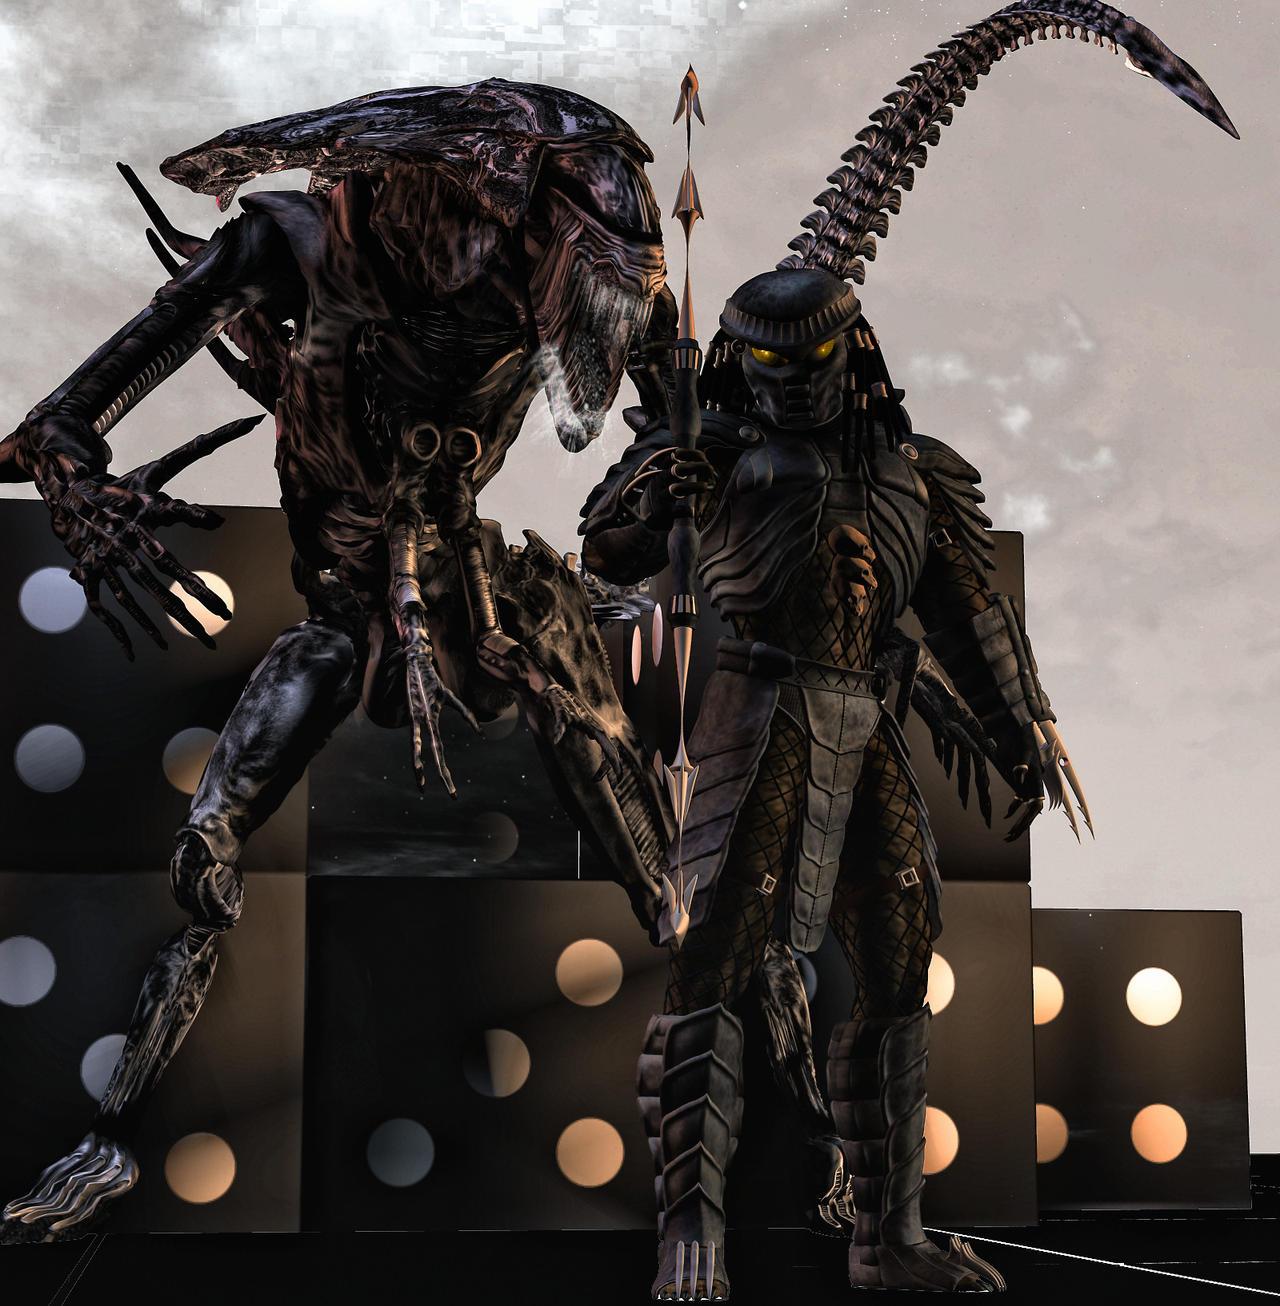 aliens vs predator drawings - photo #30